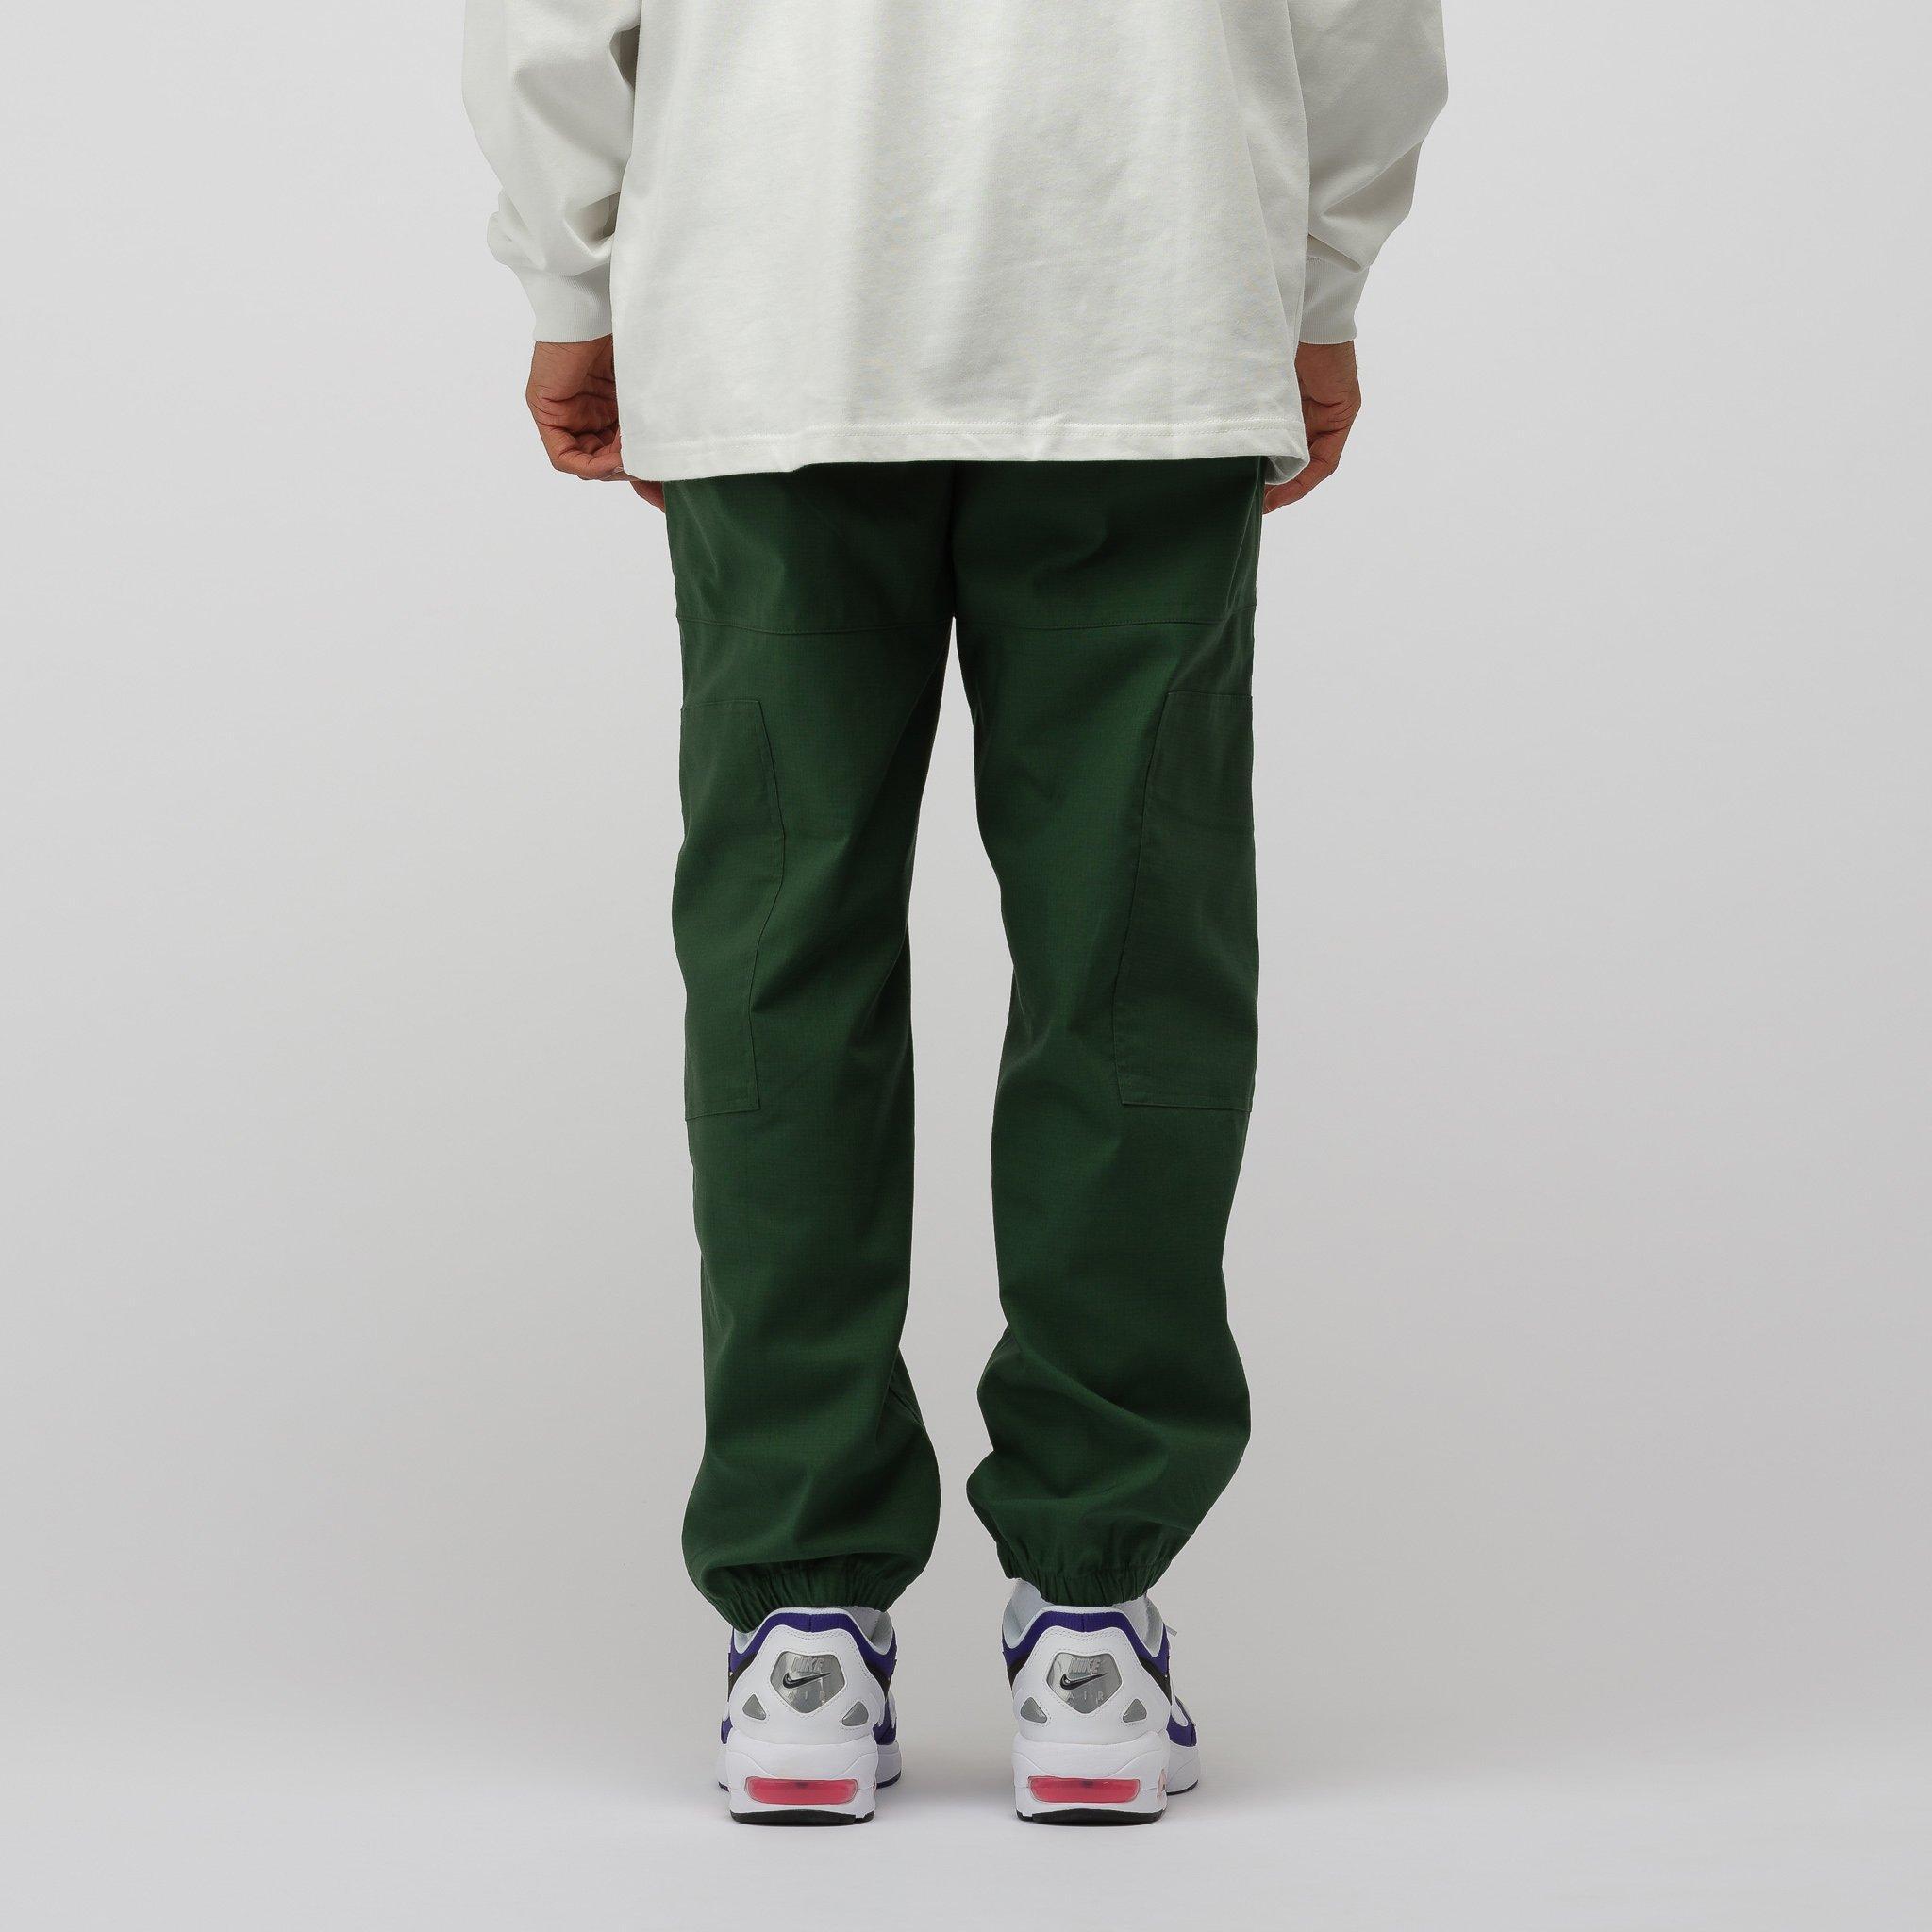 jerarquía Espectador Buen sentimiento  Nike Cotton Acg Trail Pants In Fir/black for Men - Lyst